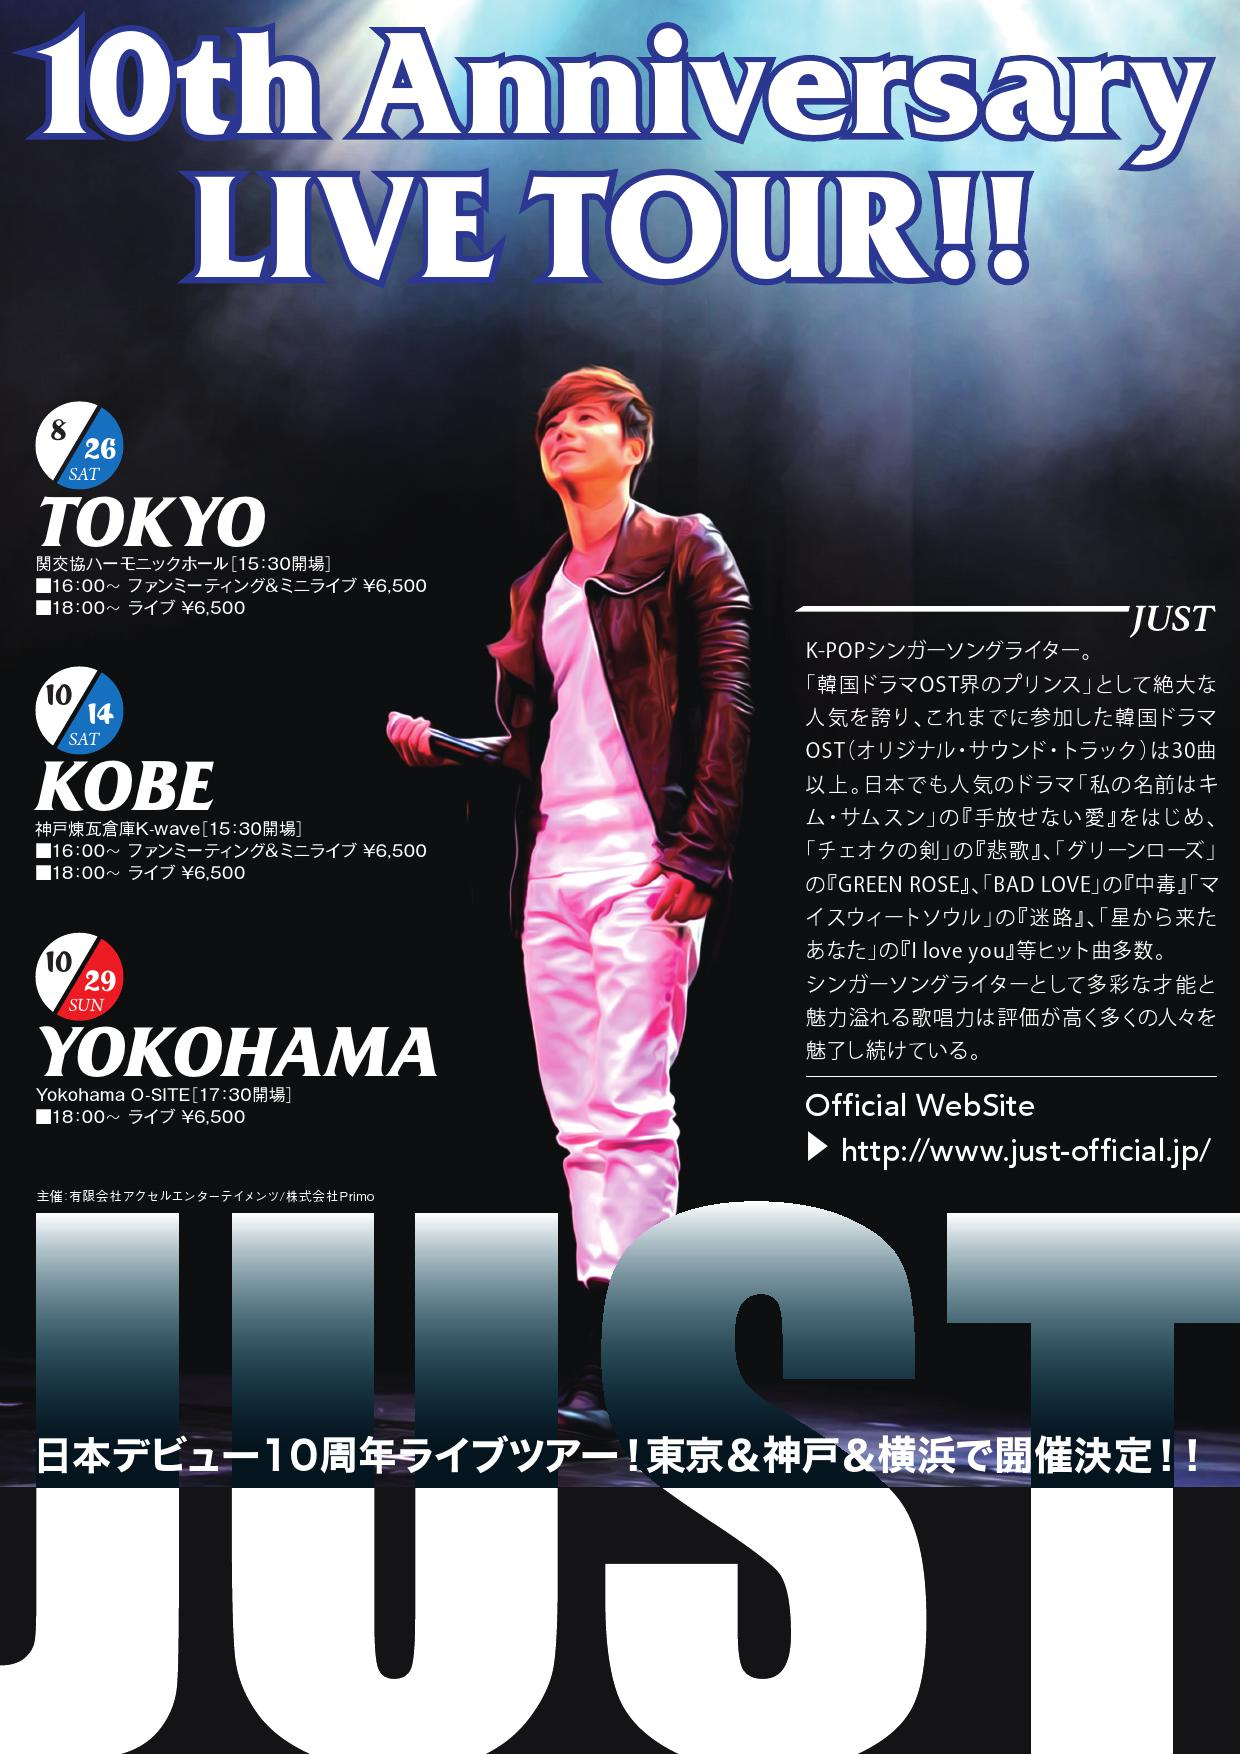 JUST 10th Anniversary LIVE TOUR  1部 ファンミーティング&ミニライブ~東京会場~